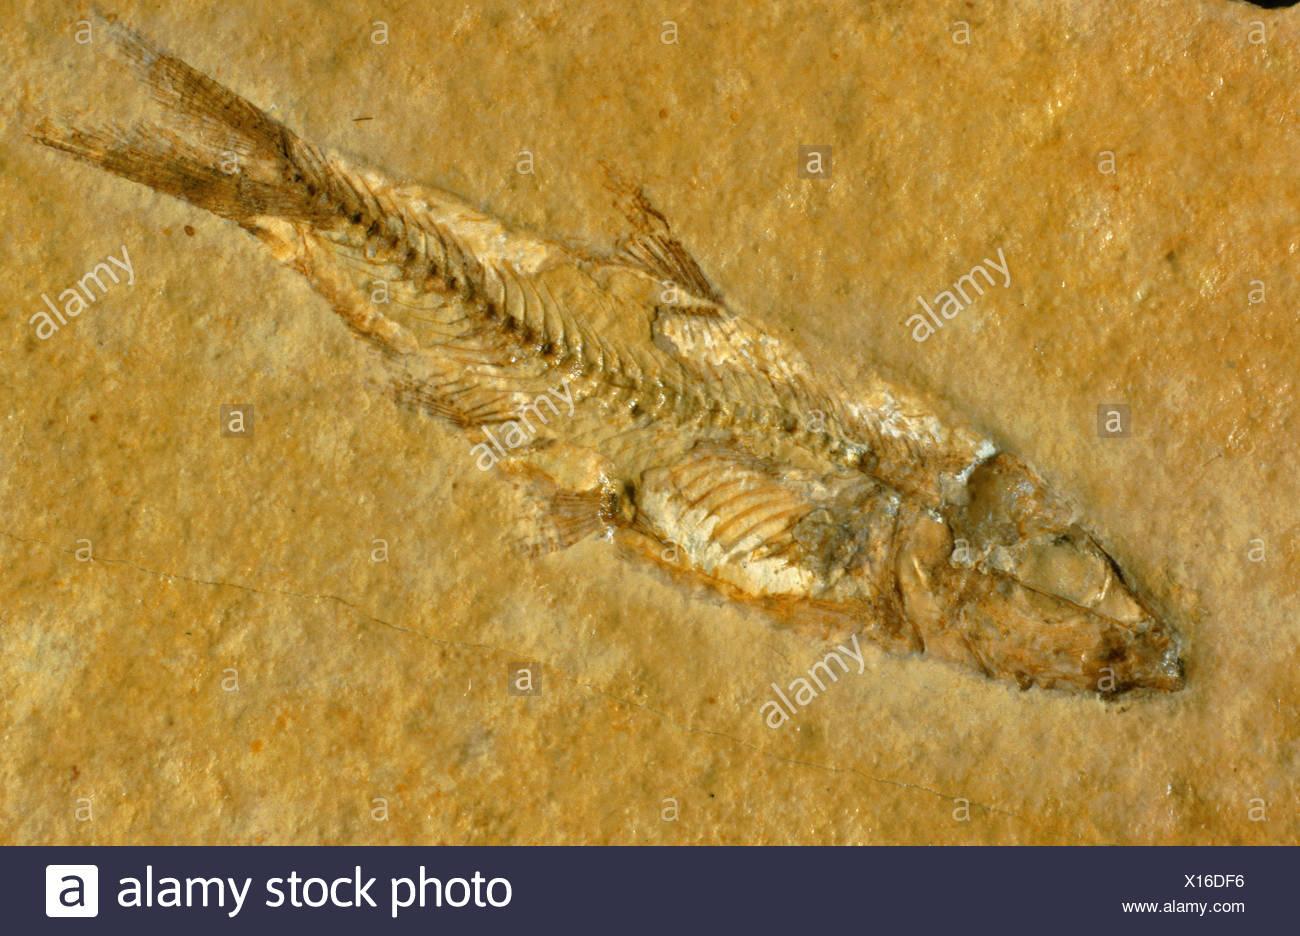 fish (Leptooeepis knorrii), fossil, Germany, Bavaria - Stock Image